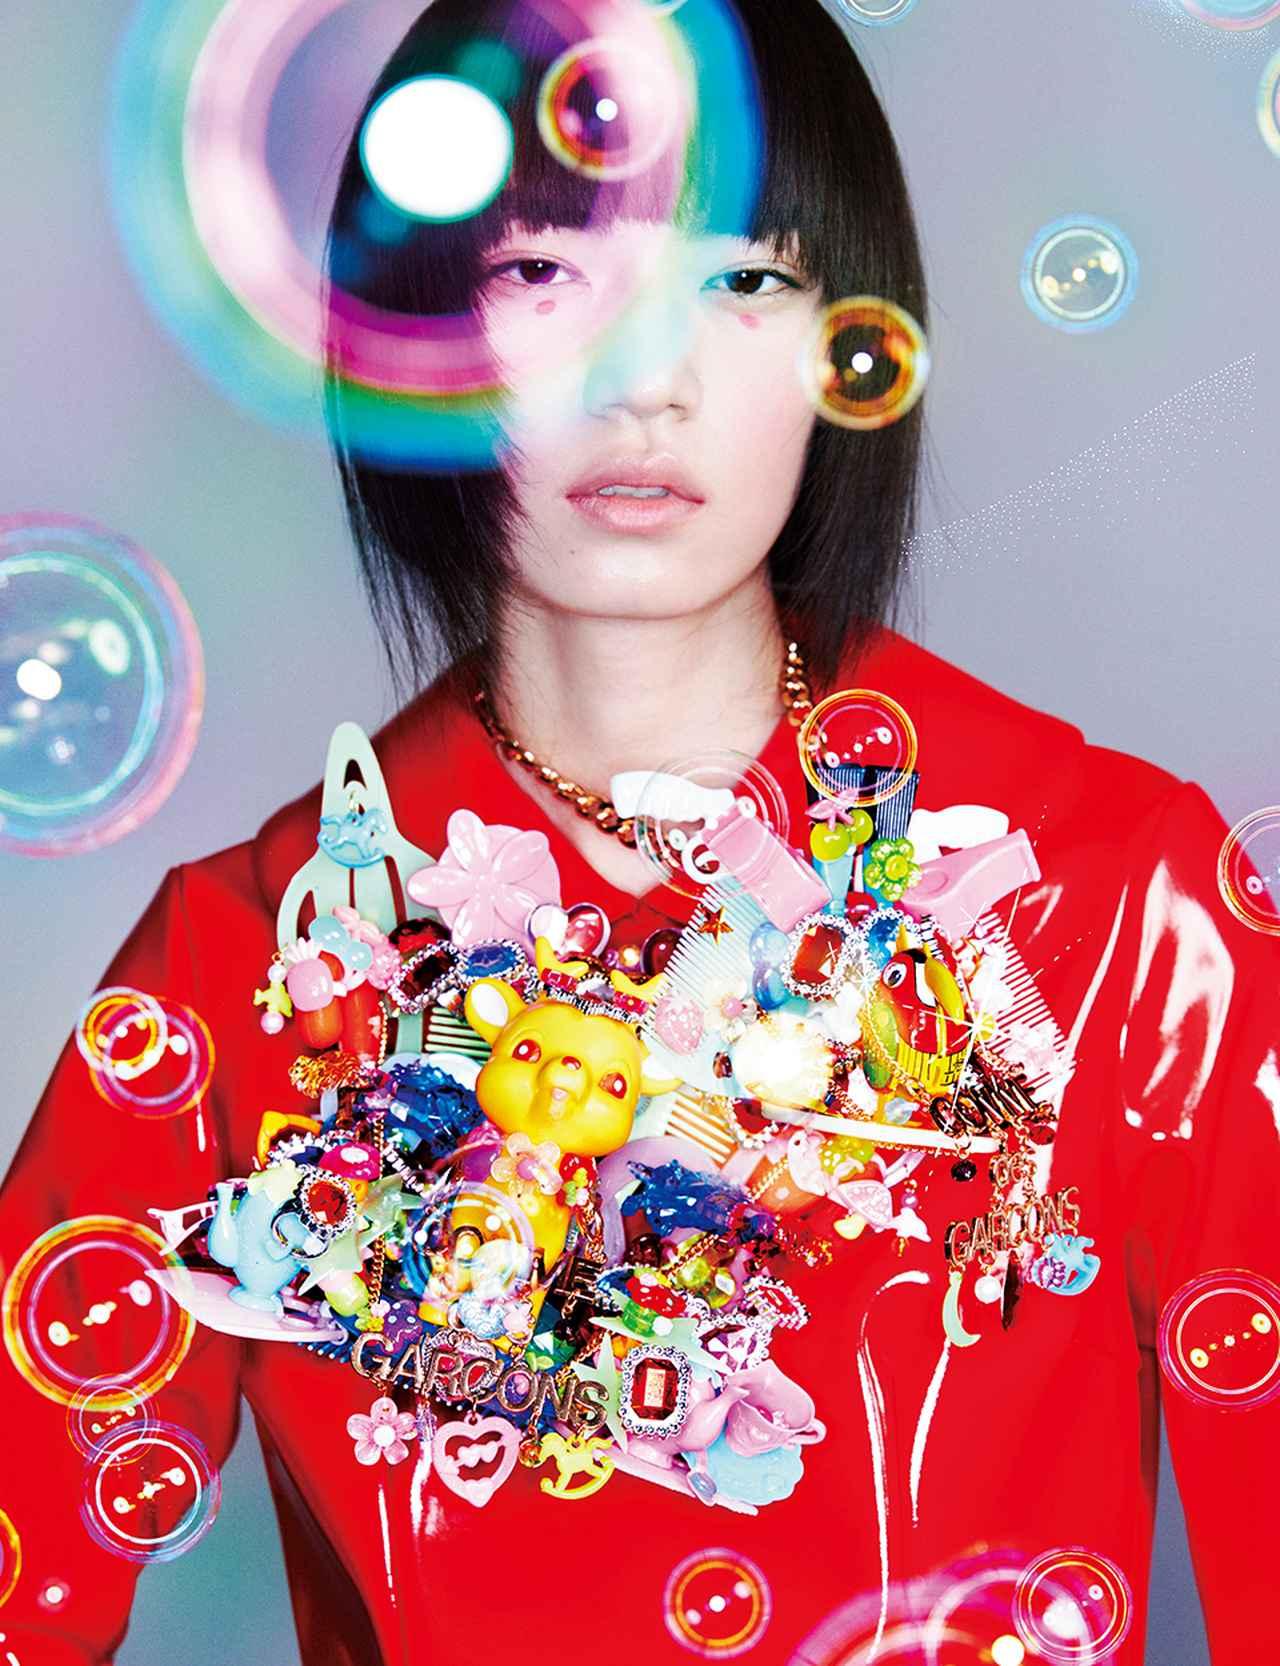 Images : 8番目の画像 - 「ファッションは愉快だ!」のアルバム - T JAPAN:The New York Times Style Magazine 公式サイト